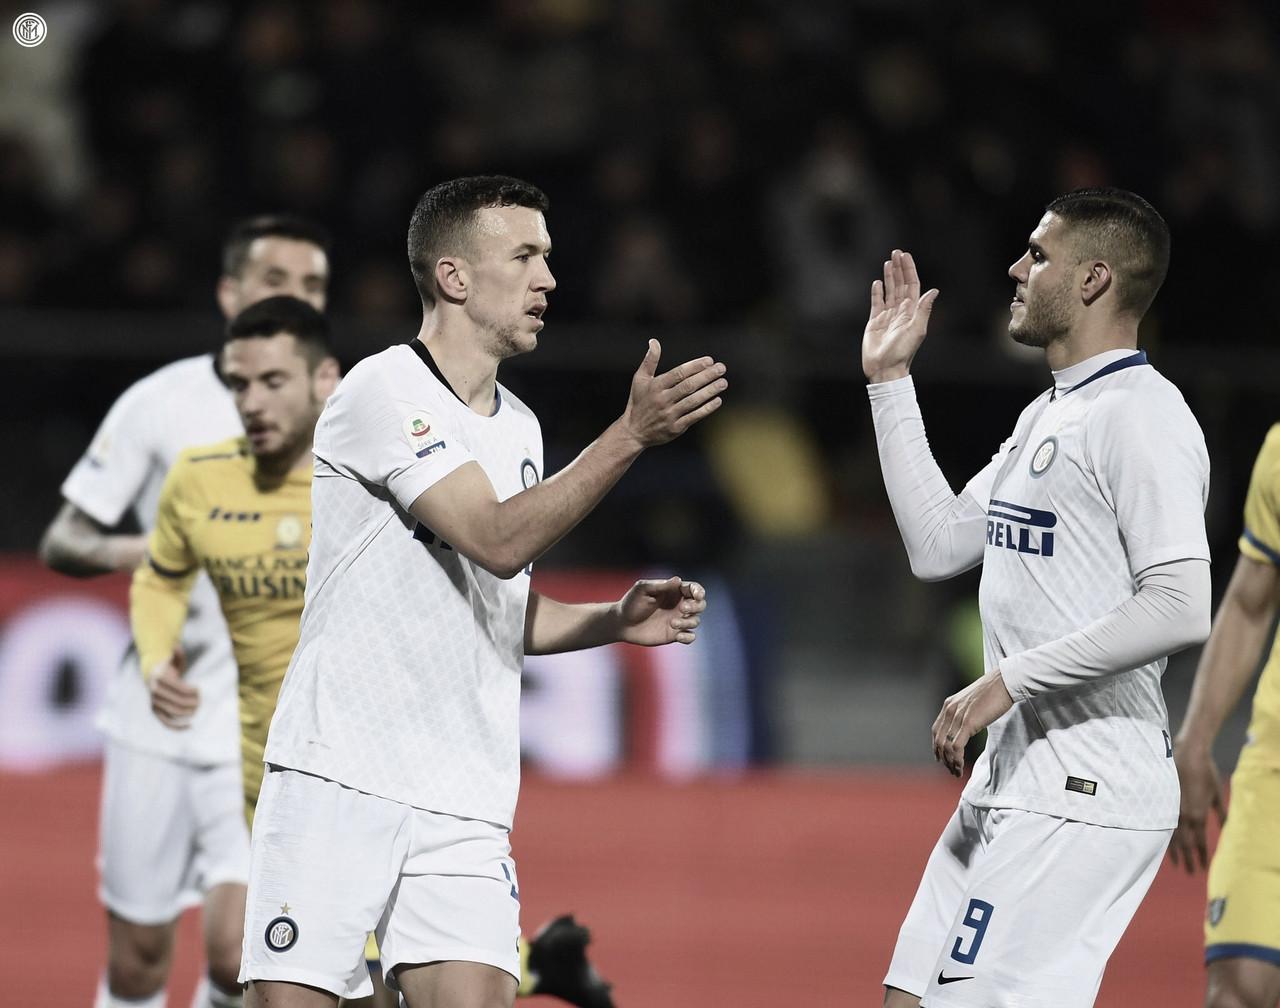 Internazionale bate Frosinone e abre vantagem na briga pela Champions League